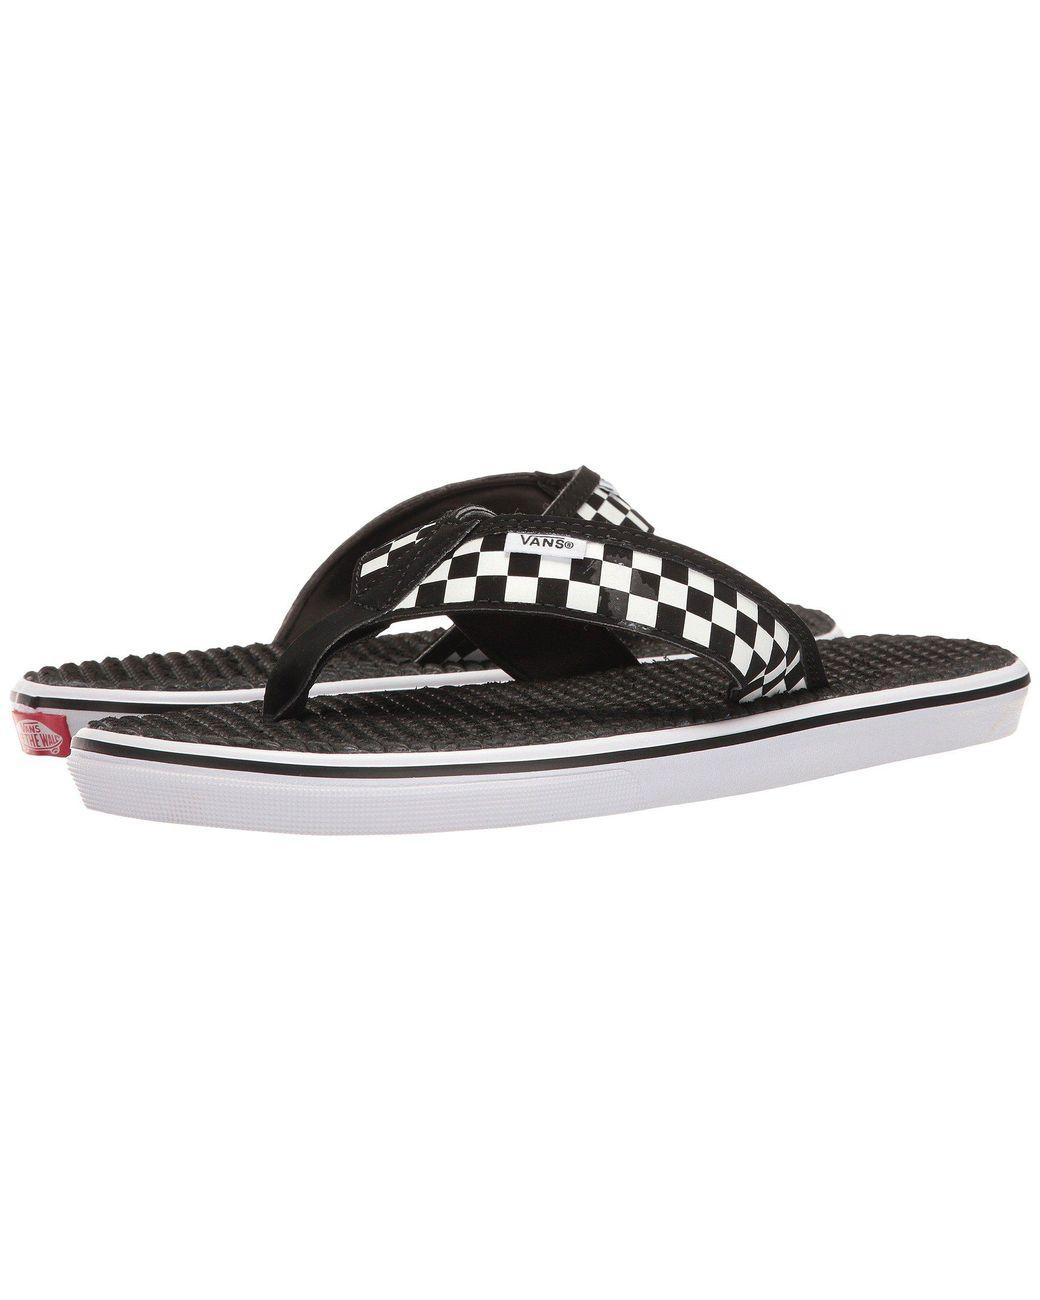 127ec78835b49b Lyst - Vans La Costa Lite ((checkerboard) Black white) Men s Sandals ...